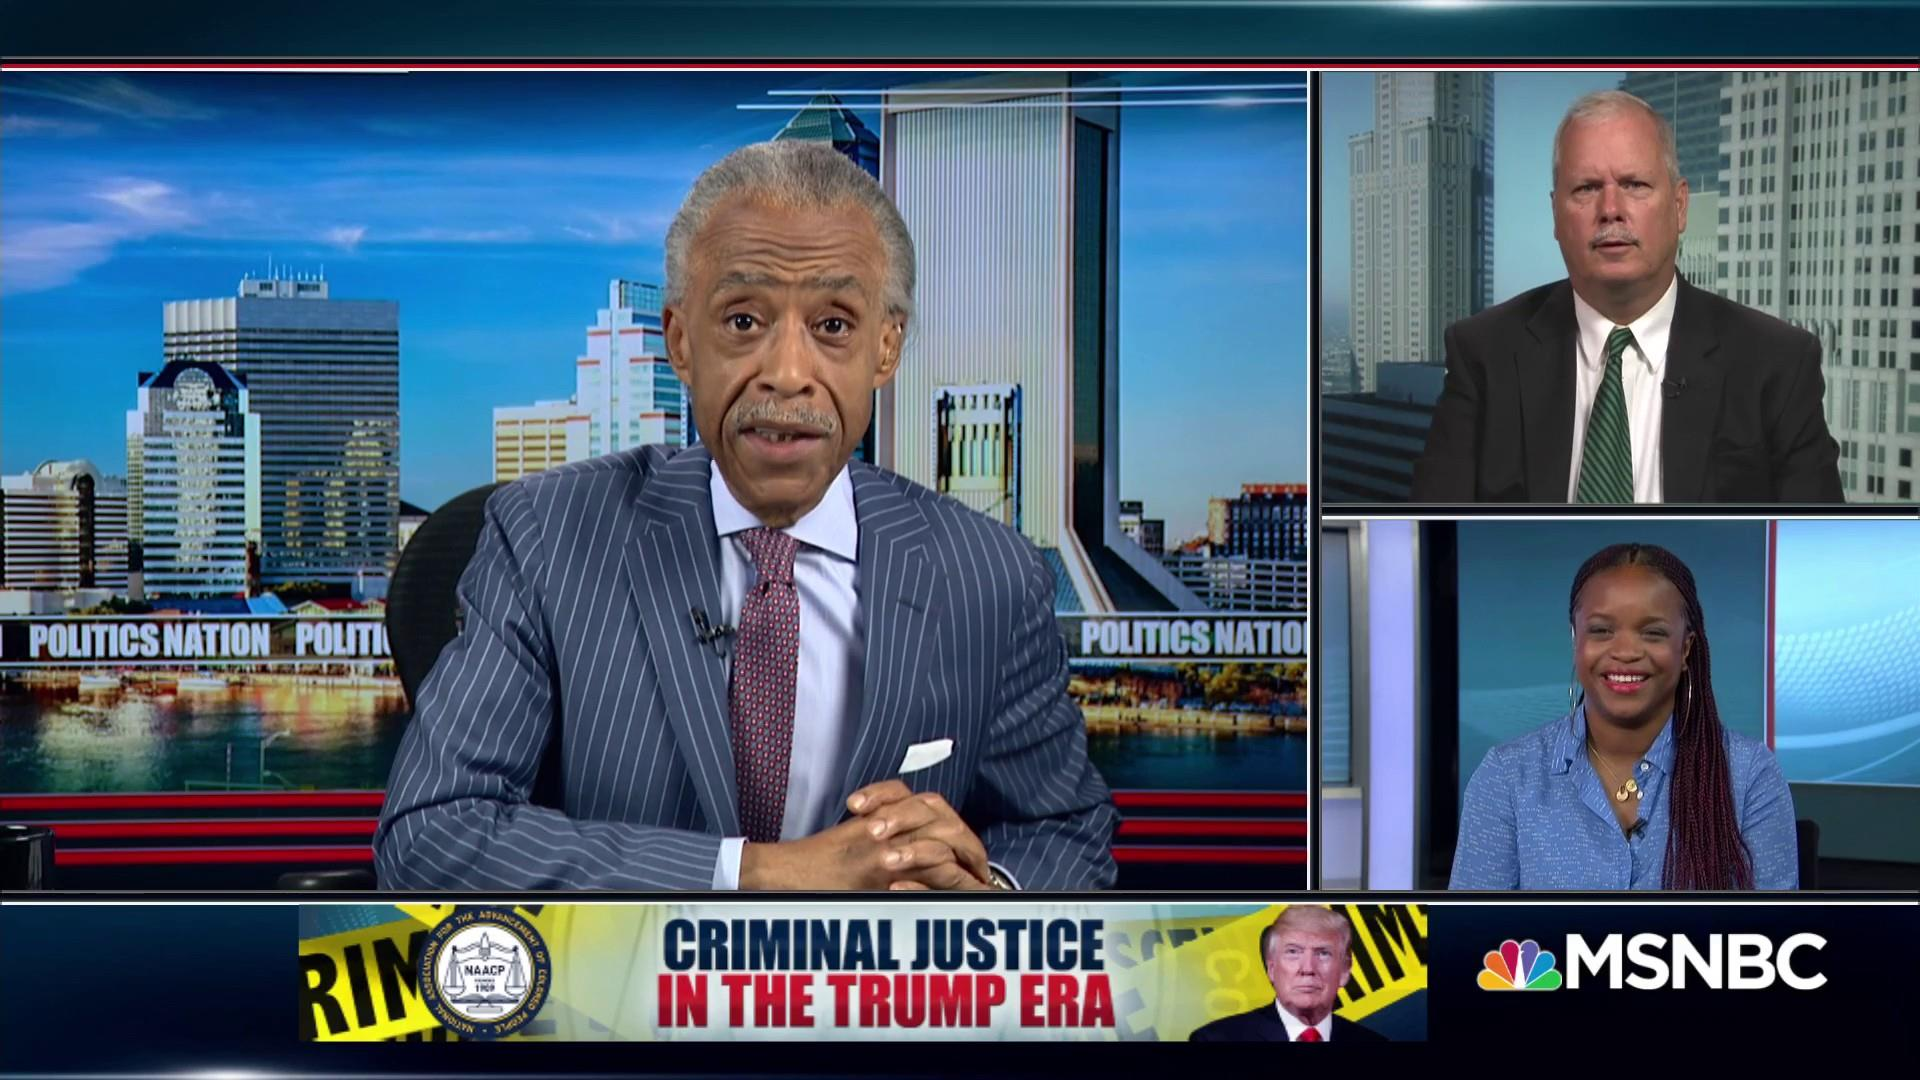 Criminal Justice In The Trump Era